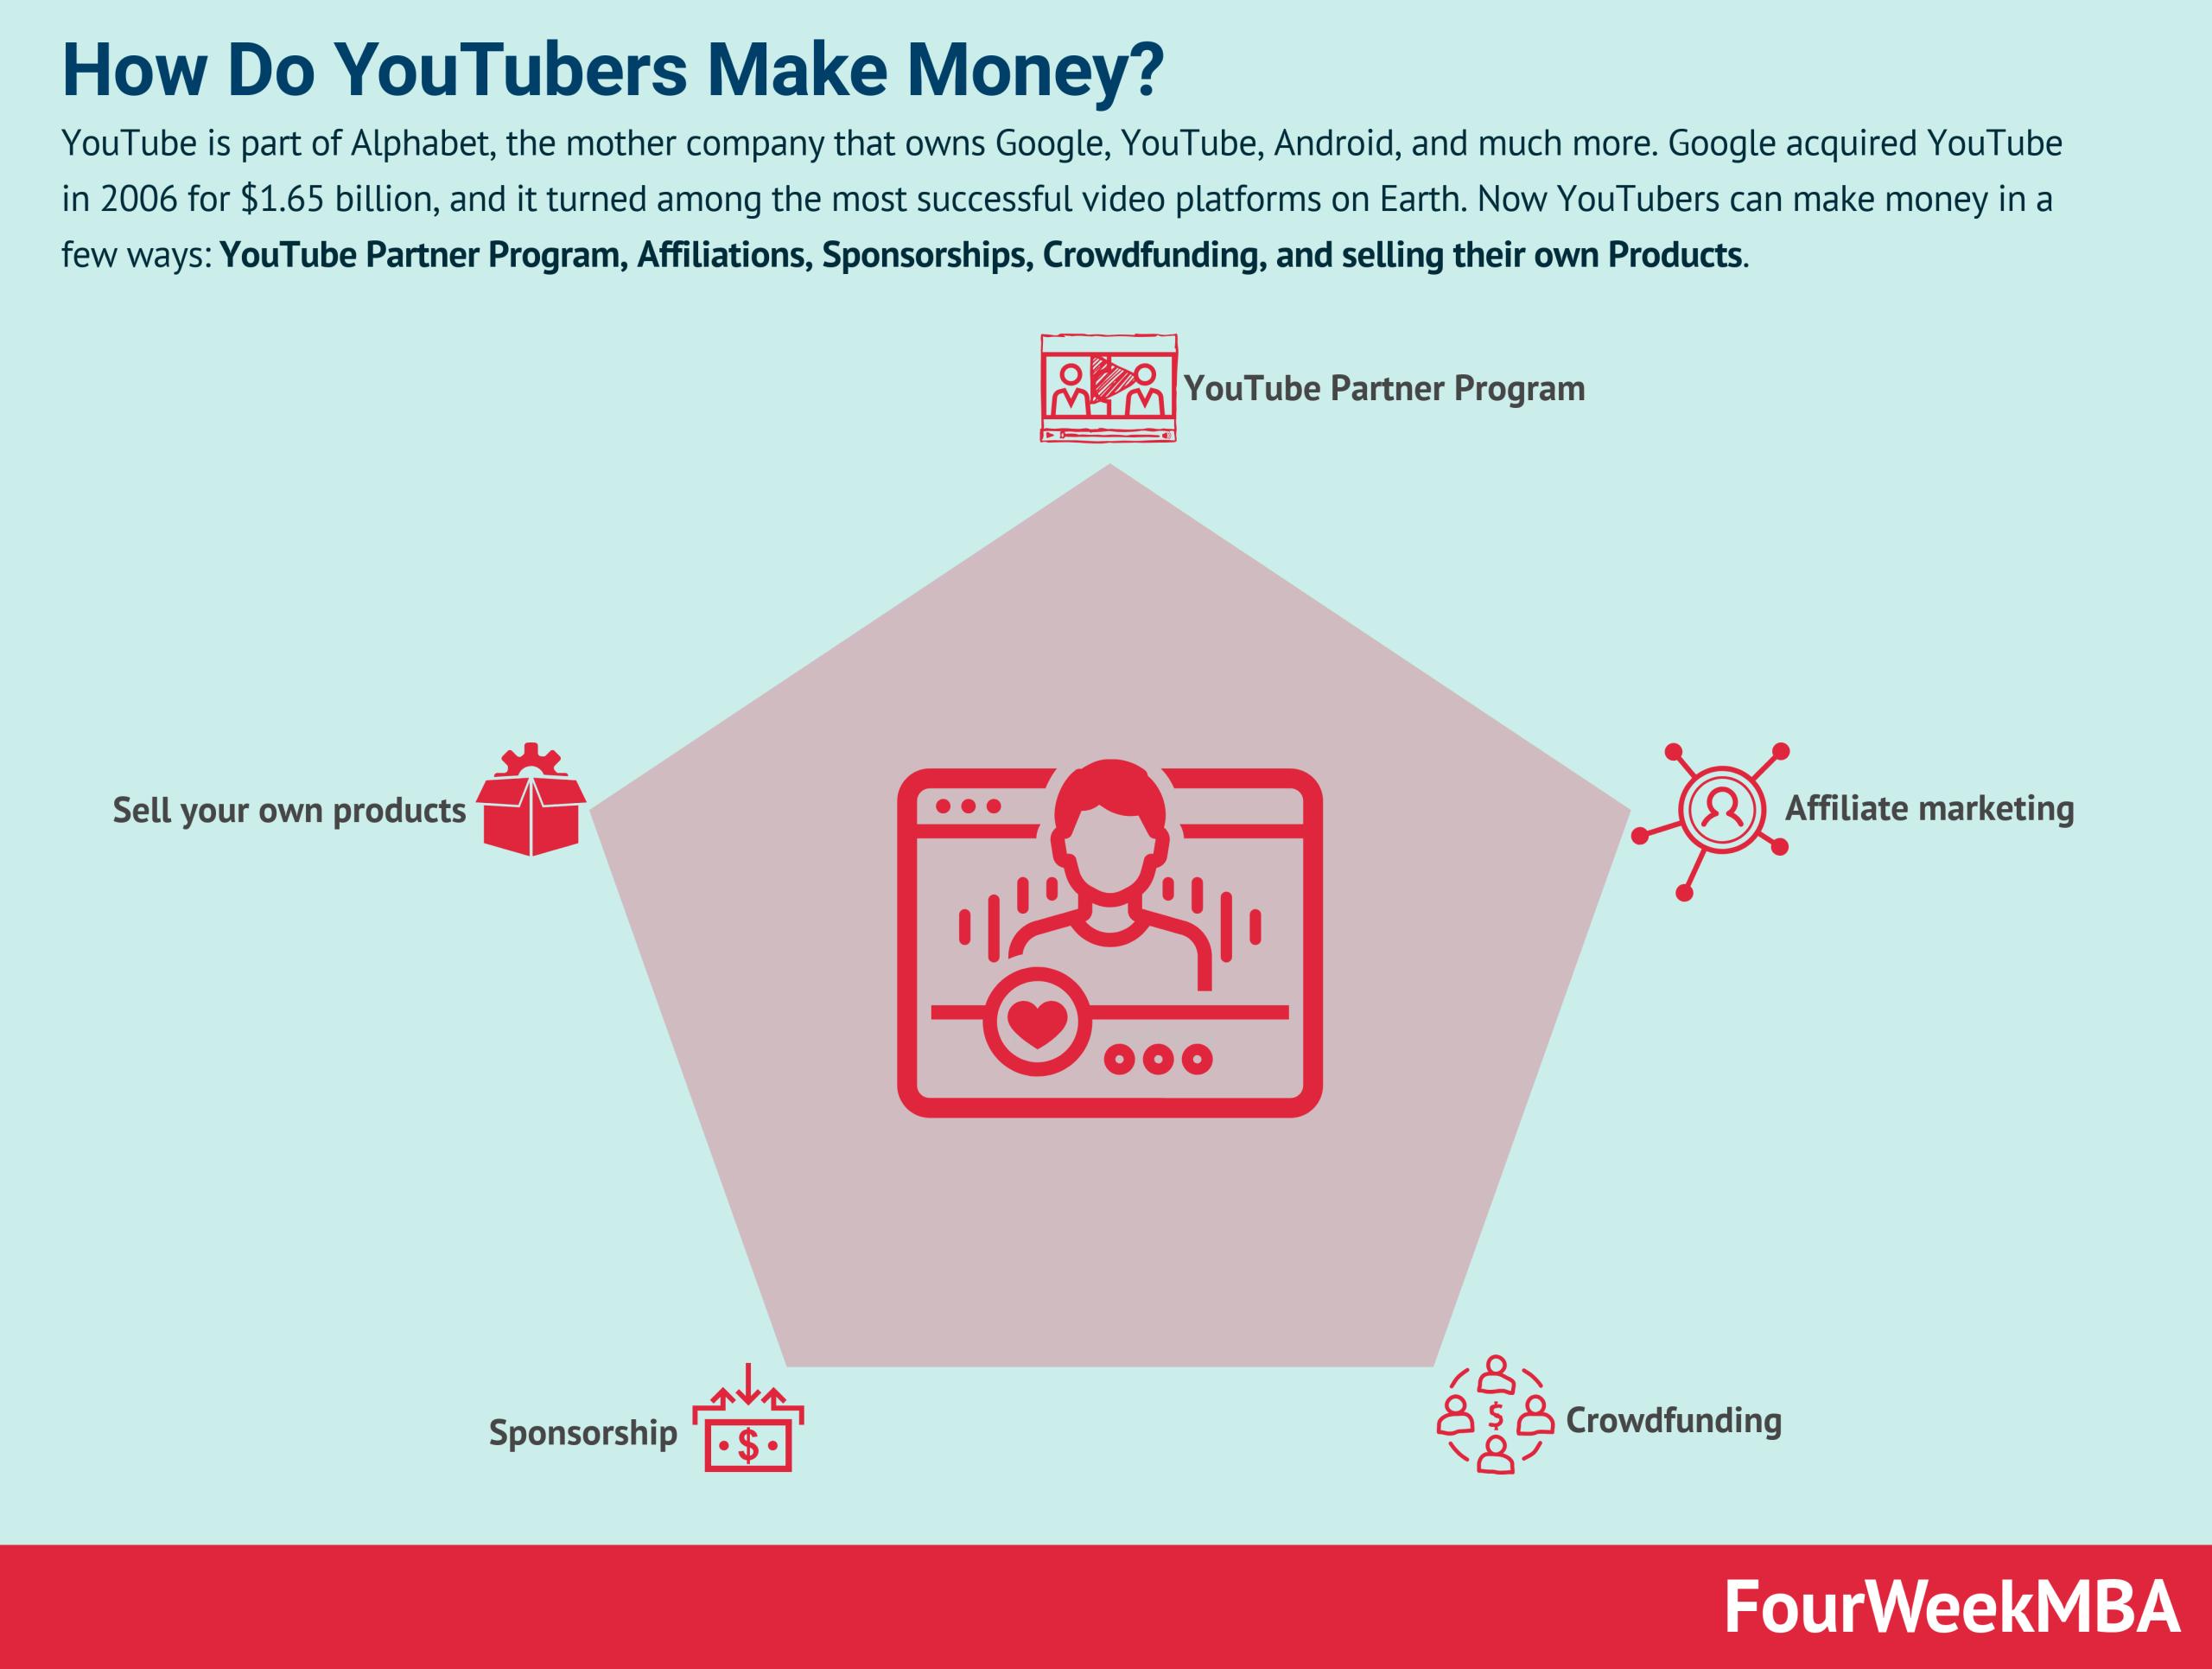 how-do-youtubers-make-money